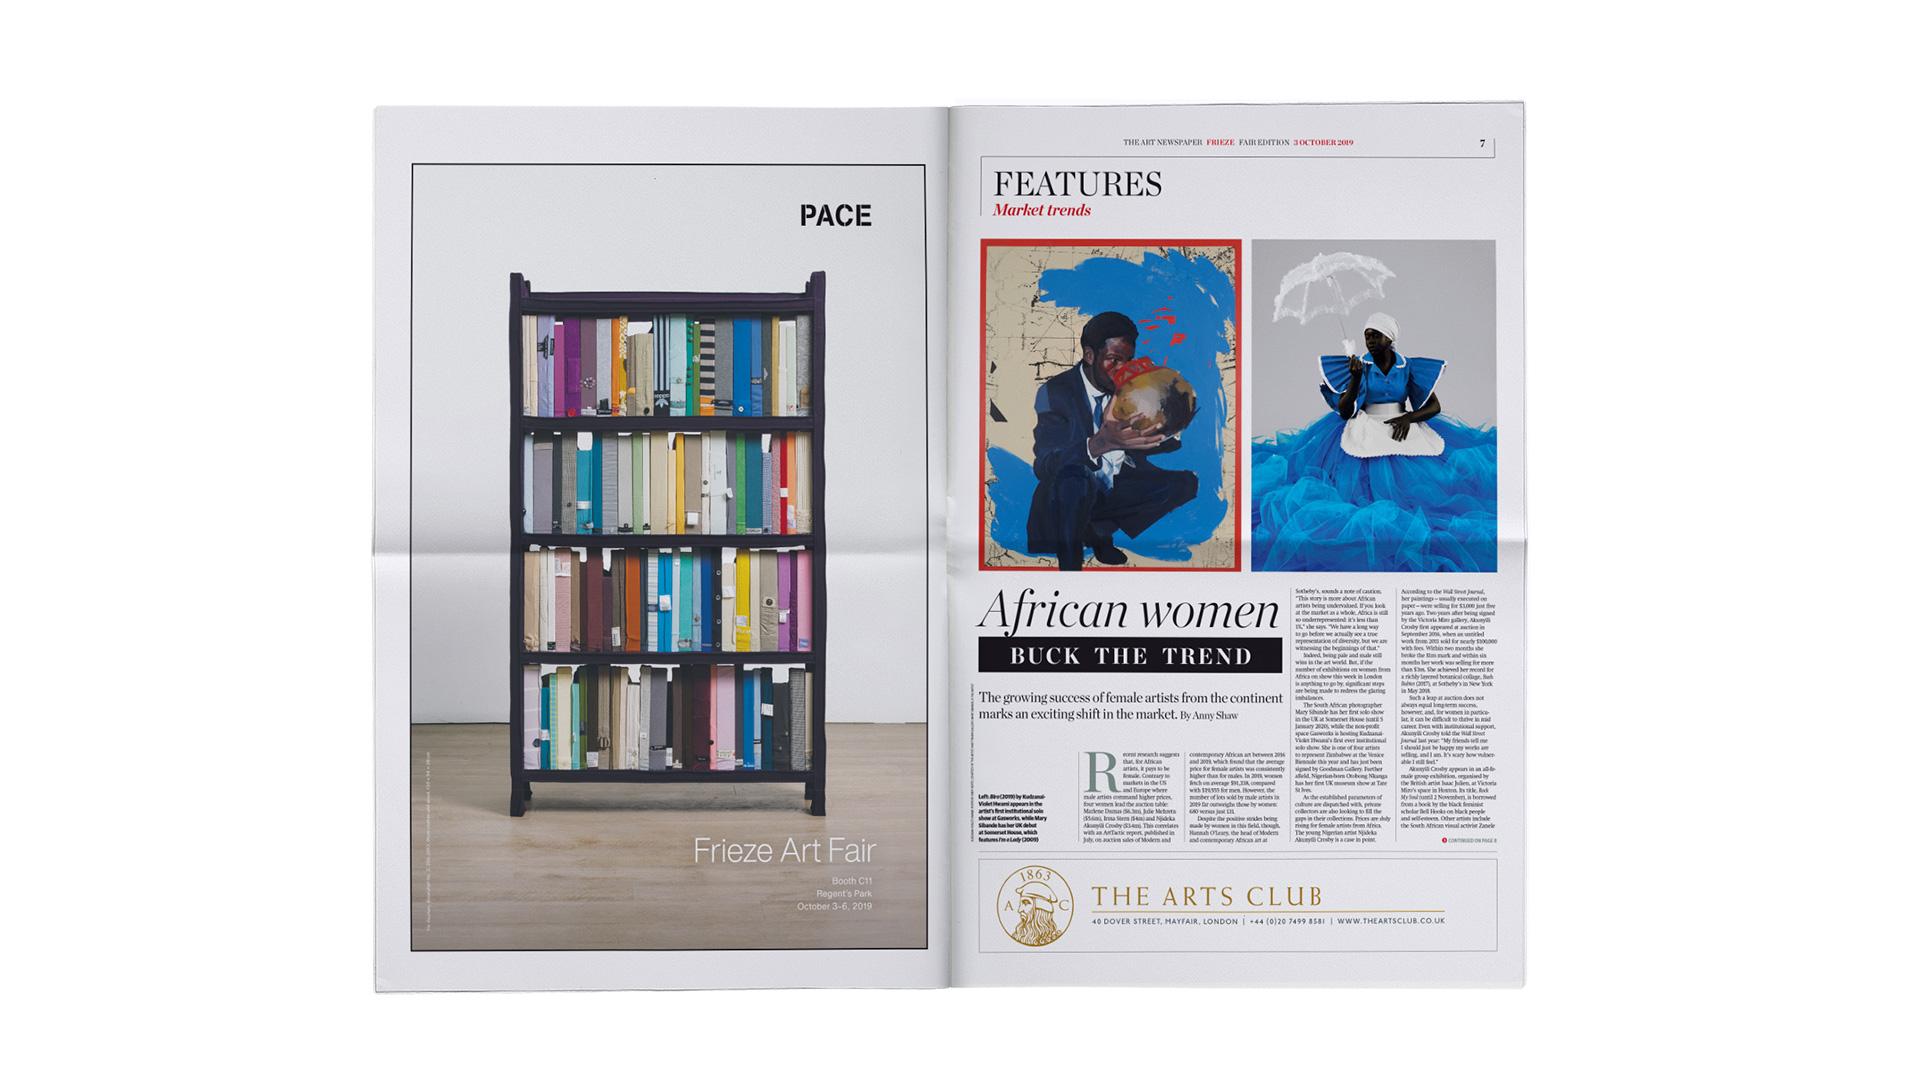 TAN-Newspaper-Frieze-LON-2019-DPS-3